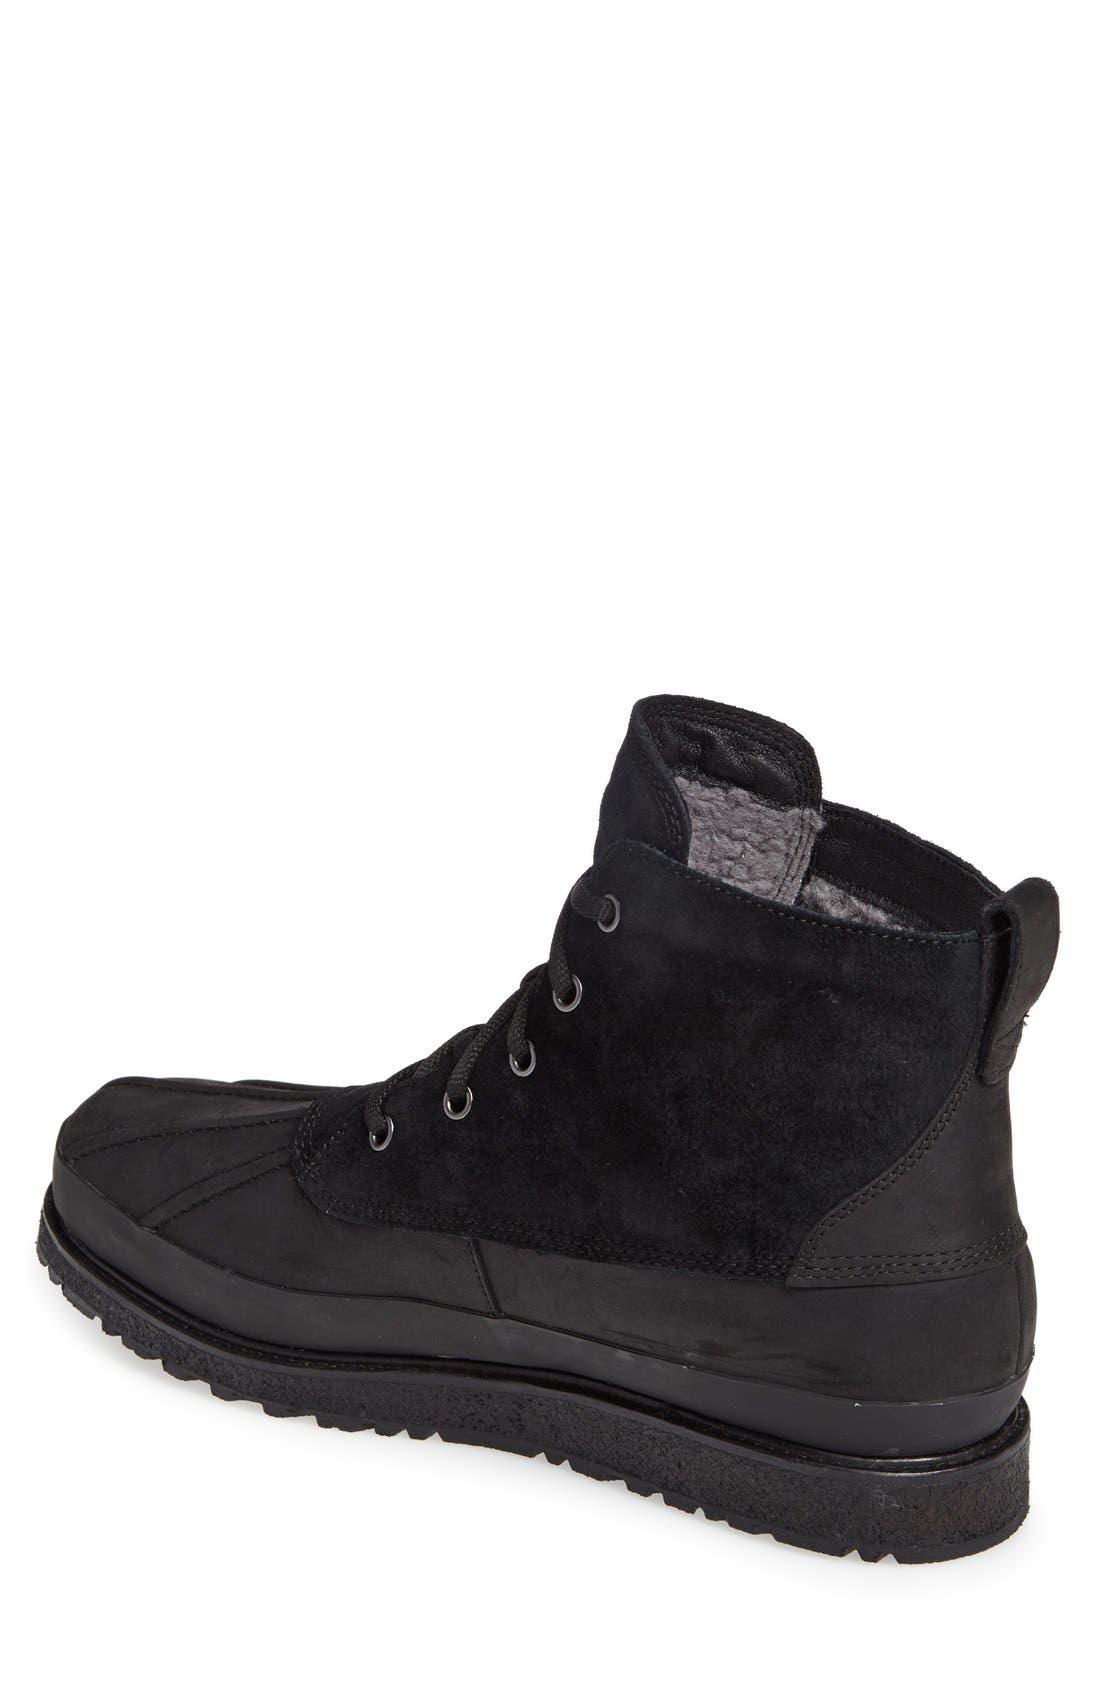 Fairbanks Waterproof Boot,                             Alternate thumbnail 2, color,                             Black